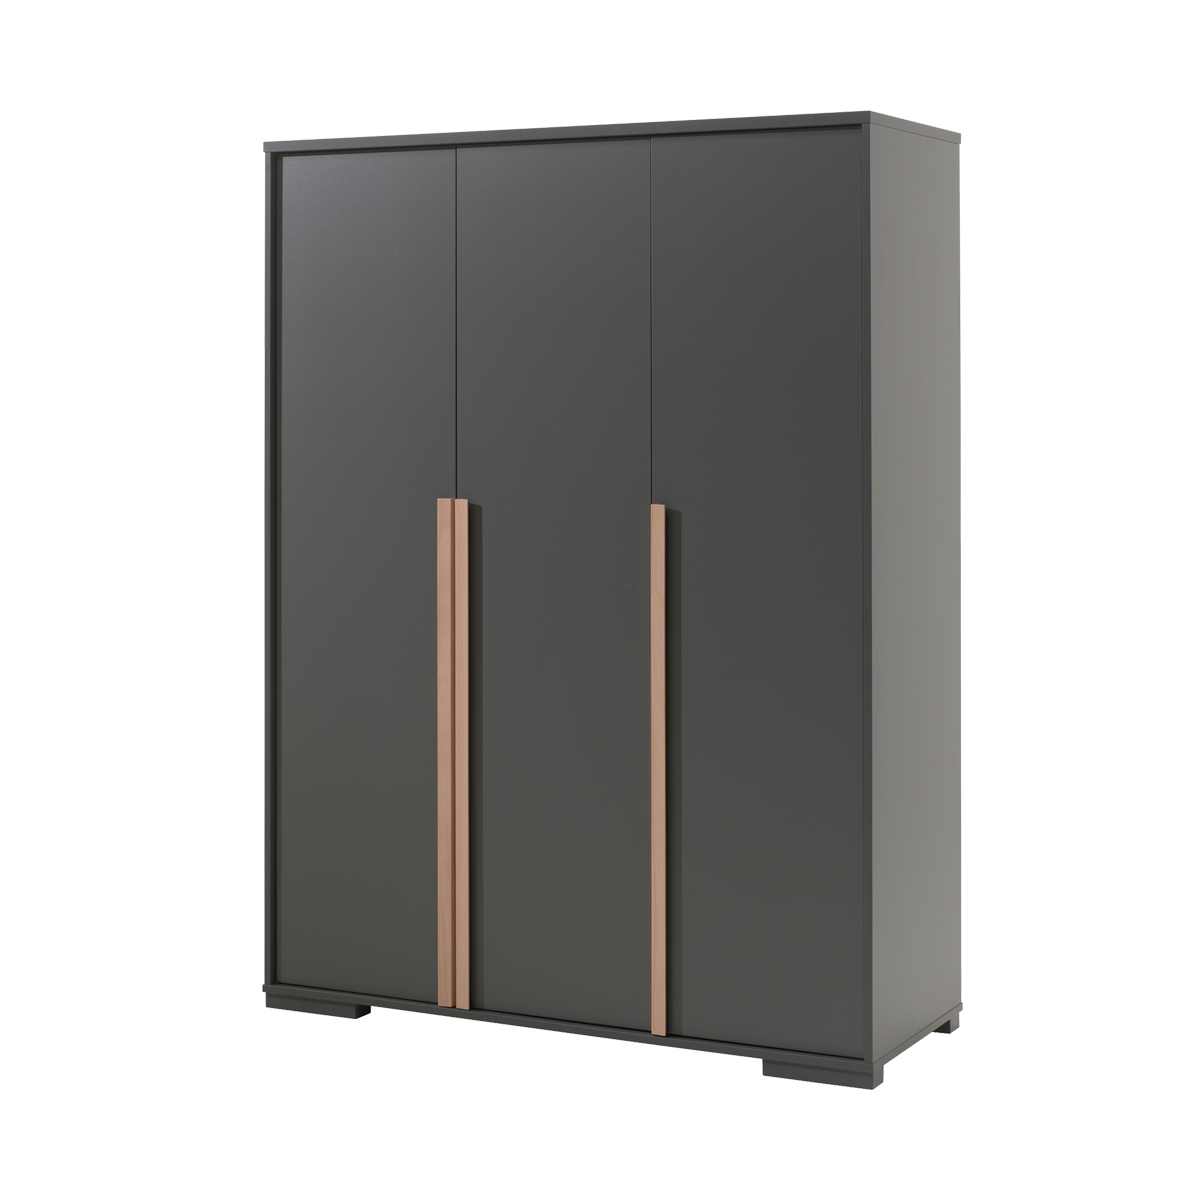 Armoire 3 portes anthracite